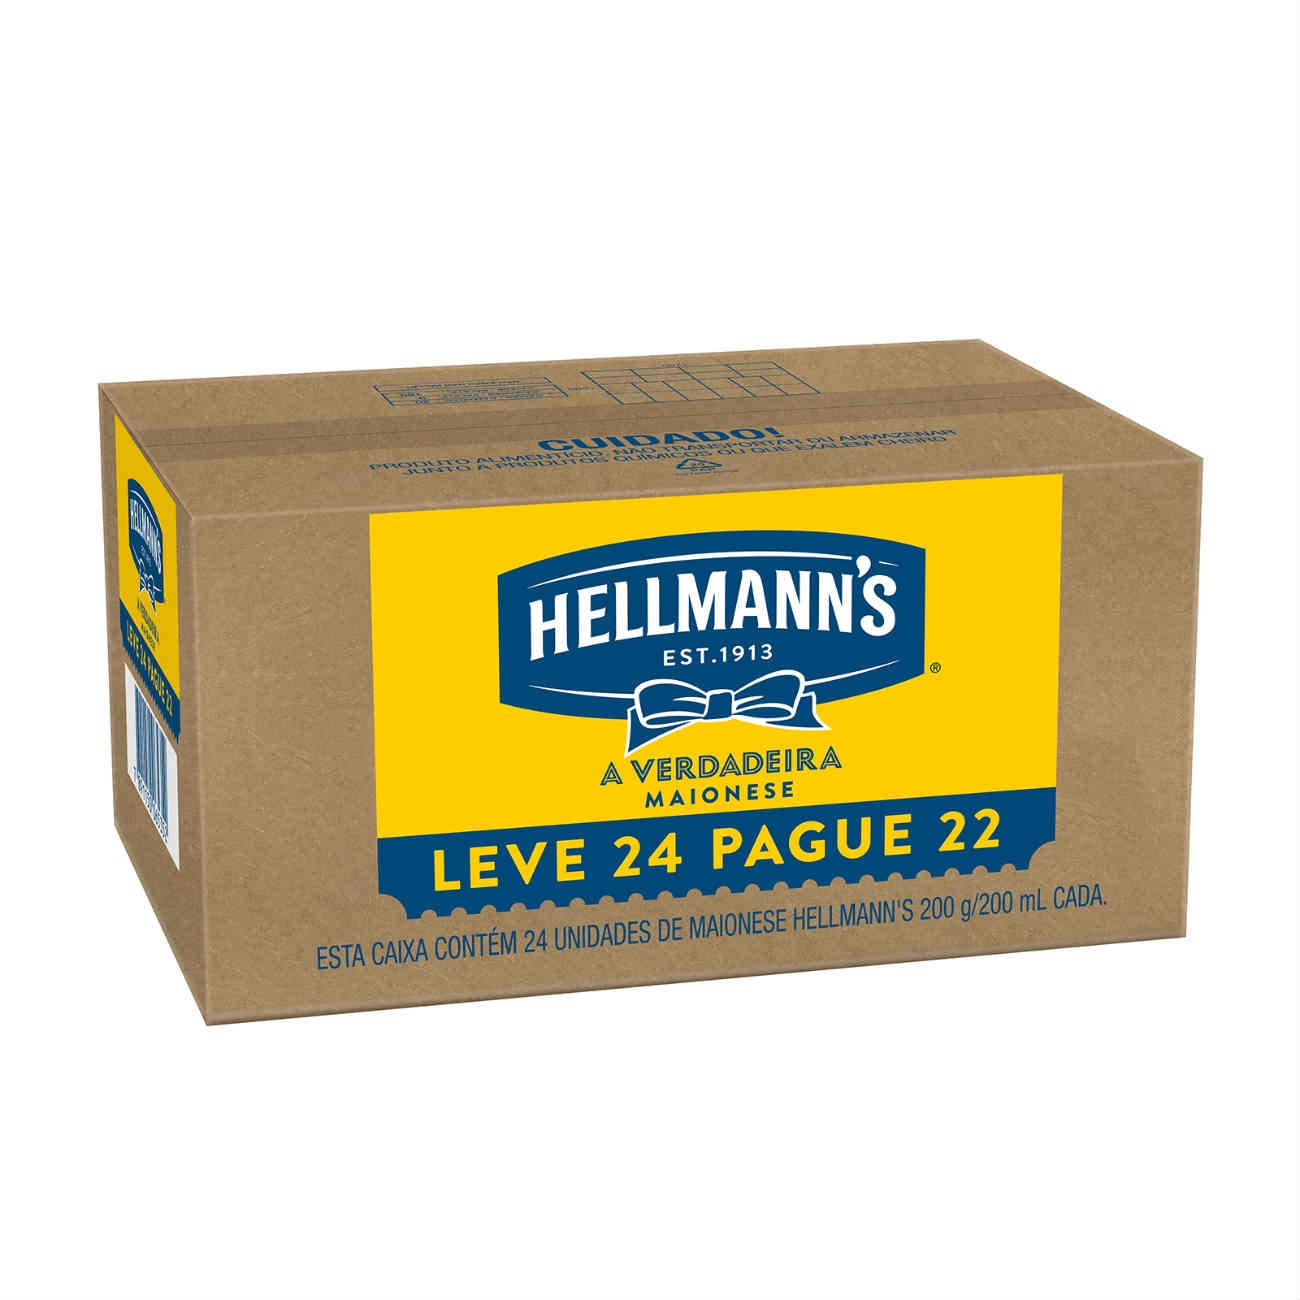 Oferta Pague 22 Leve 24 Maionese Hellmann's Tradicional 200g